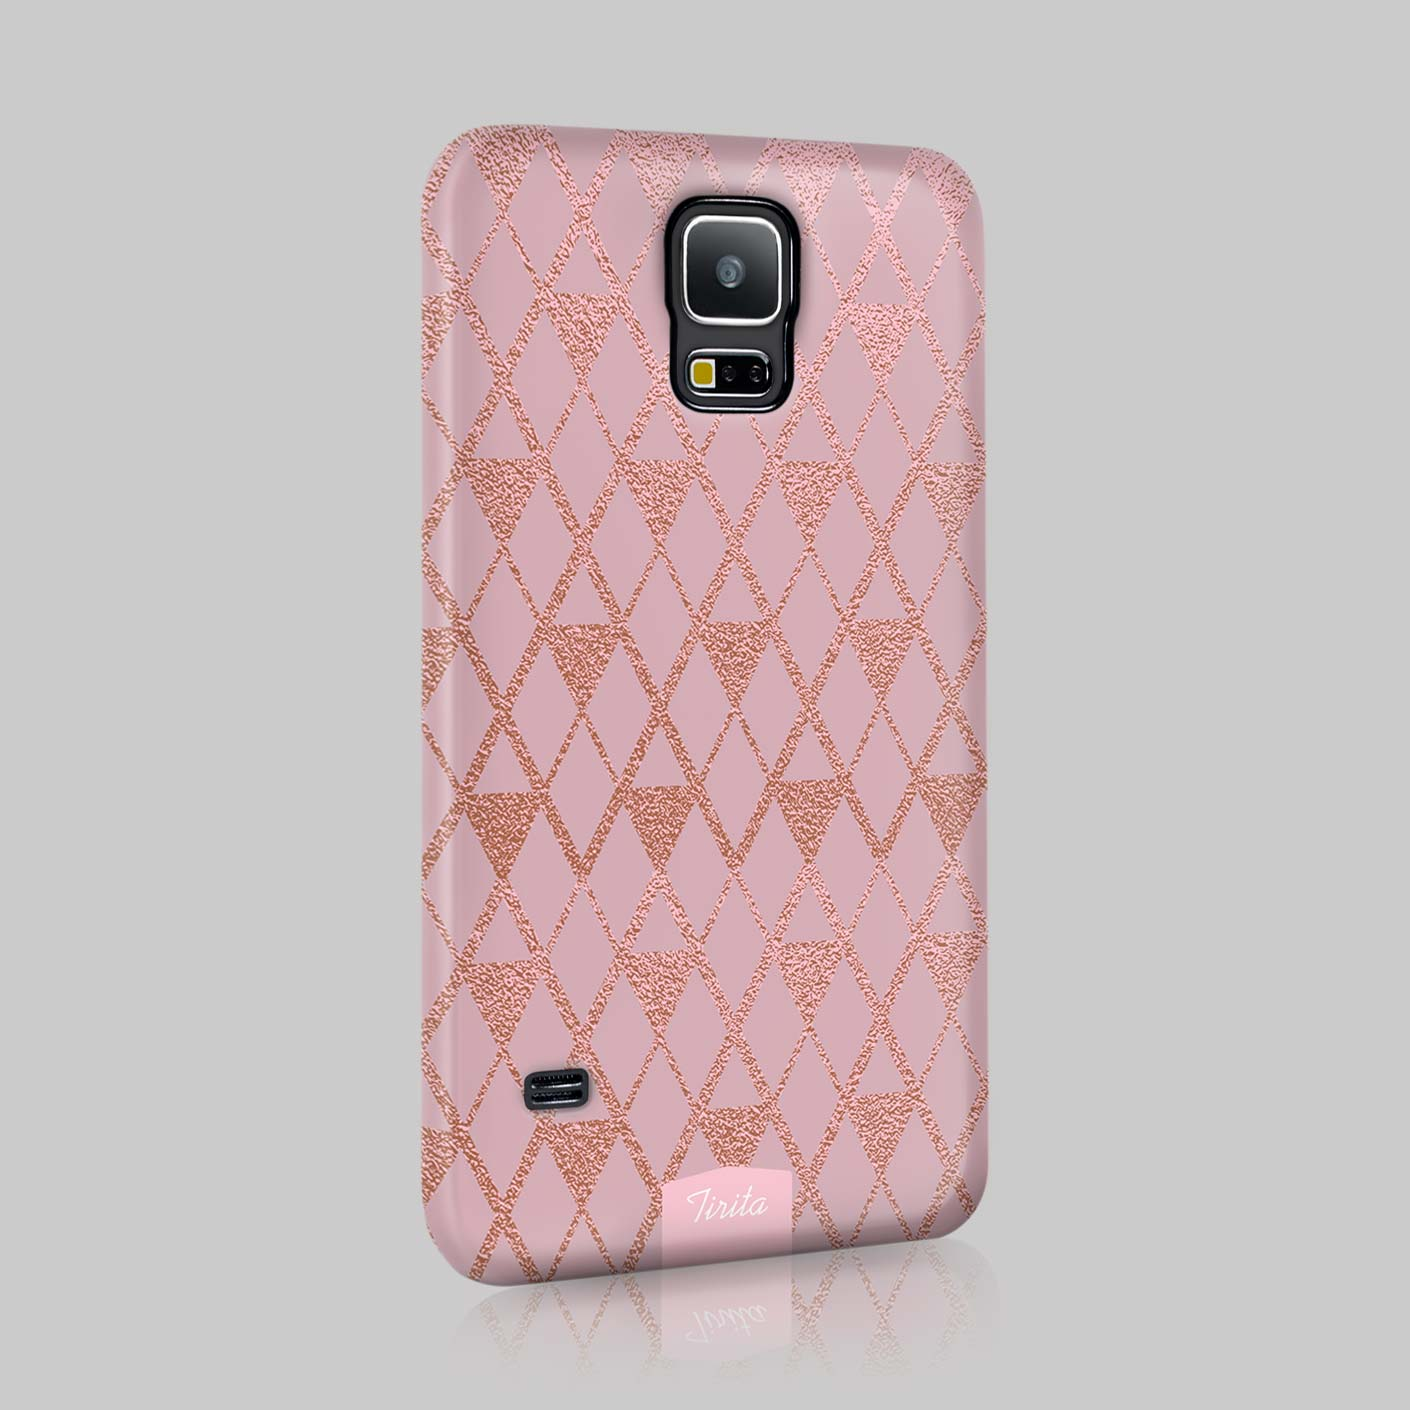 Tirita Metallic Golden Silver Glitter Effect Phone Case ...